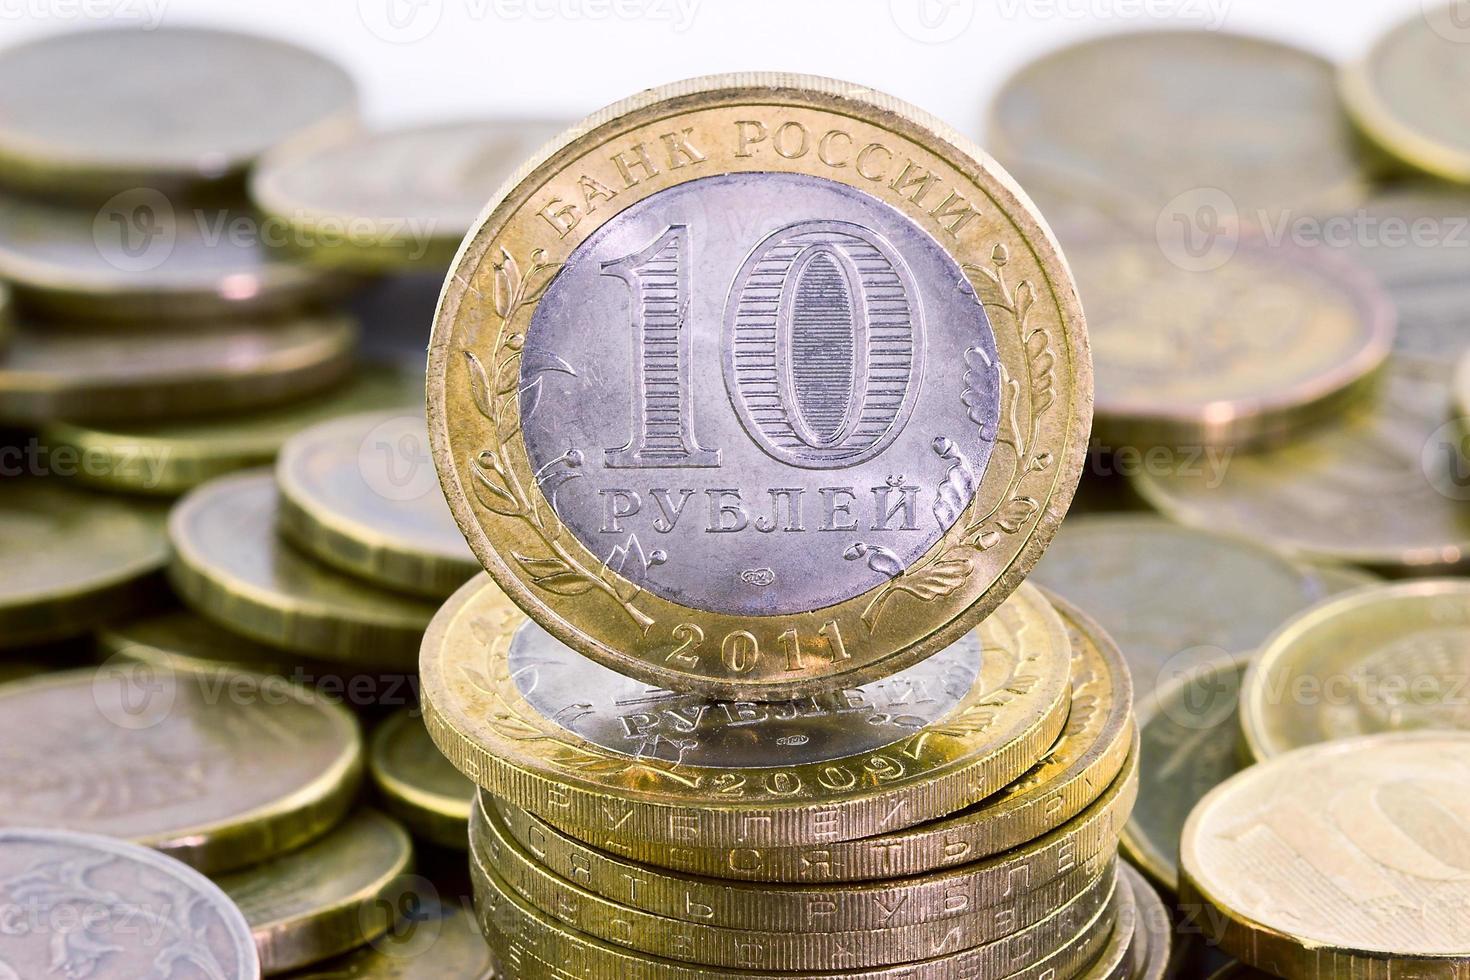 tio ryska rubel på pengarbakgrund foto